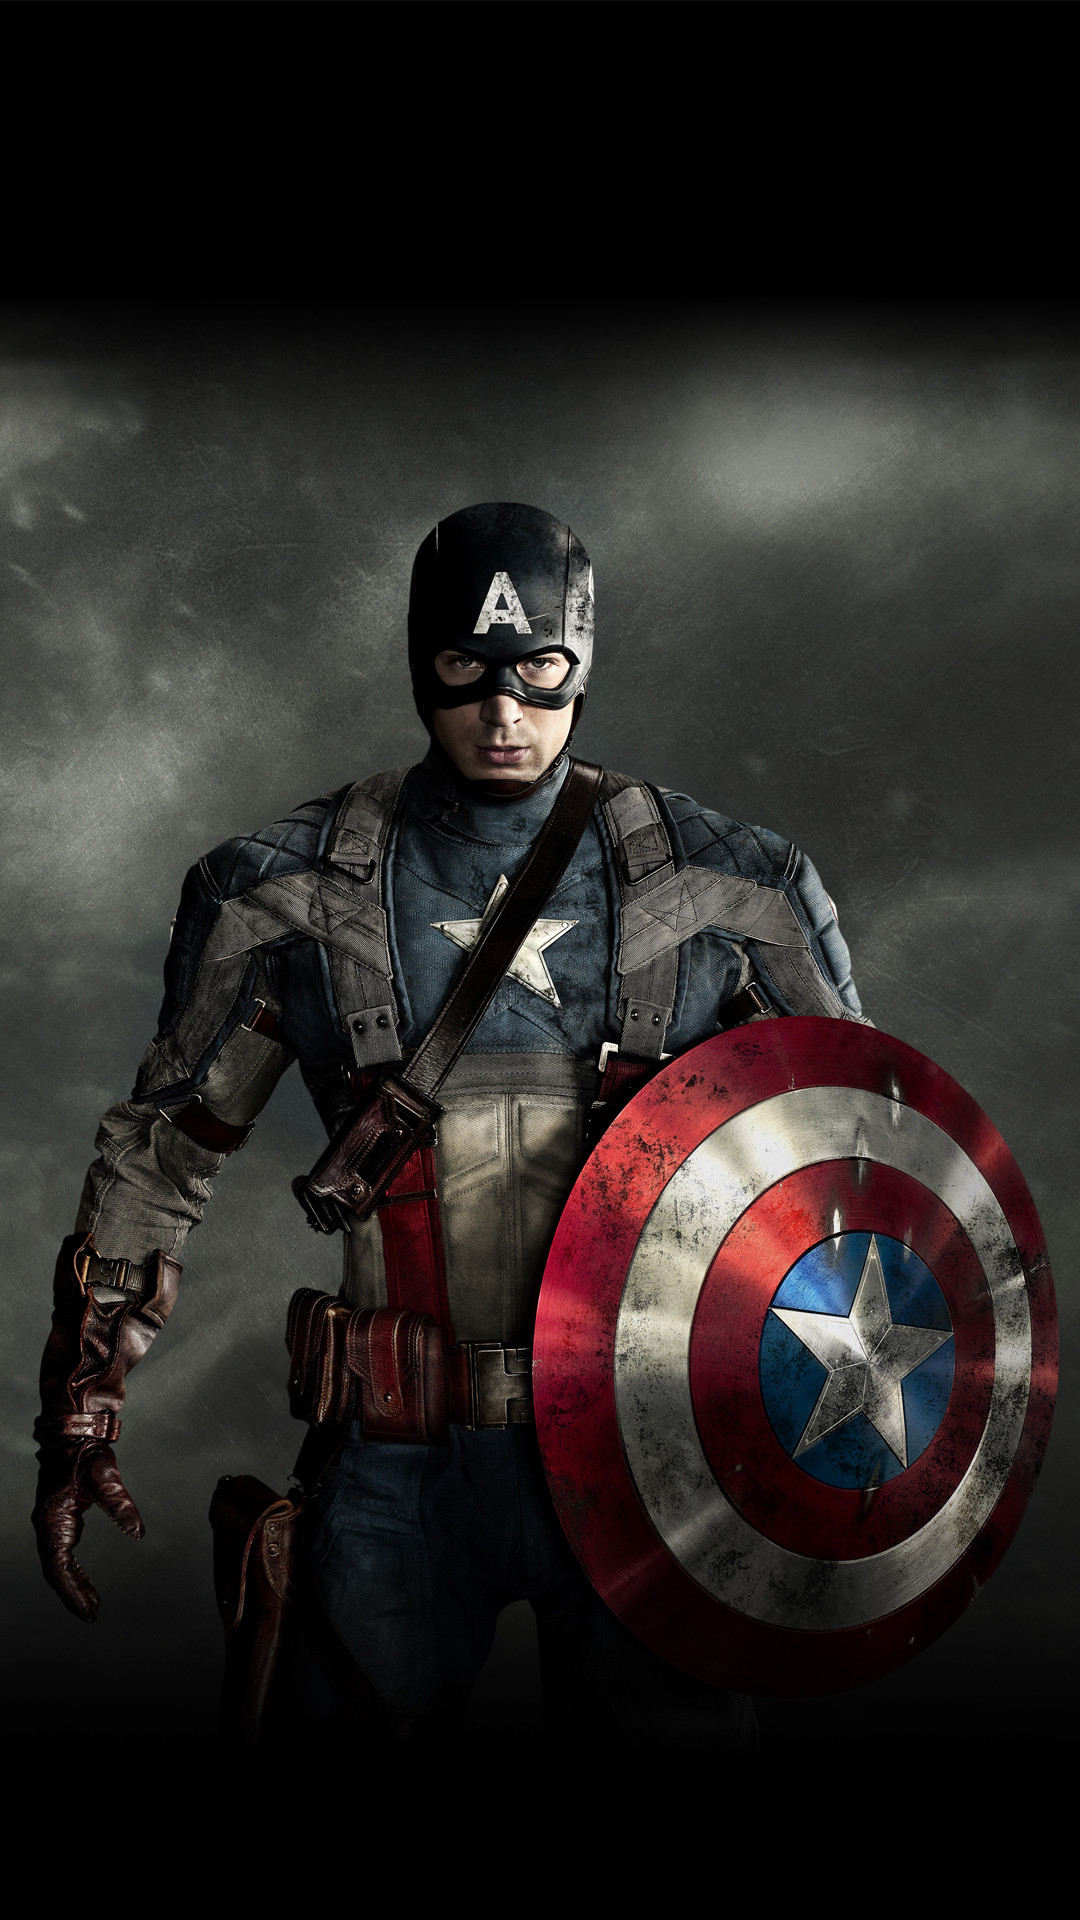 Wallpaper Captain America 3D – image #820620